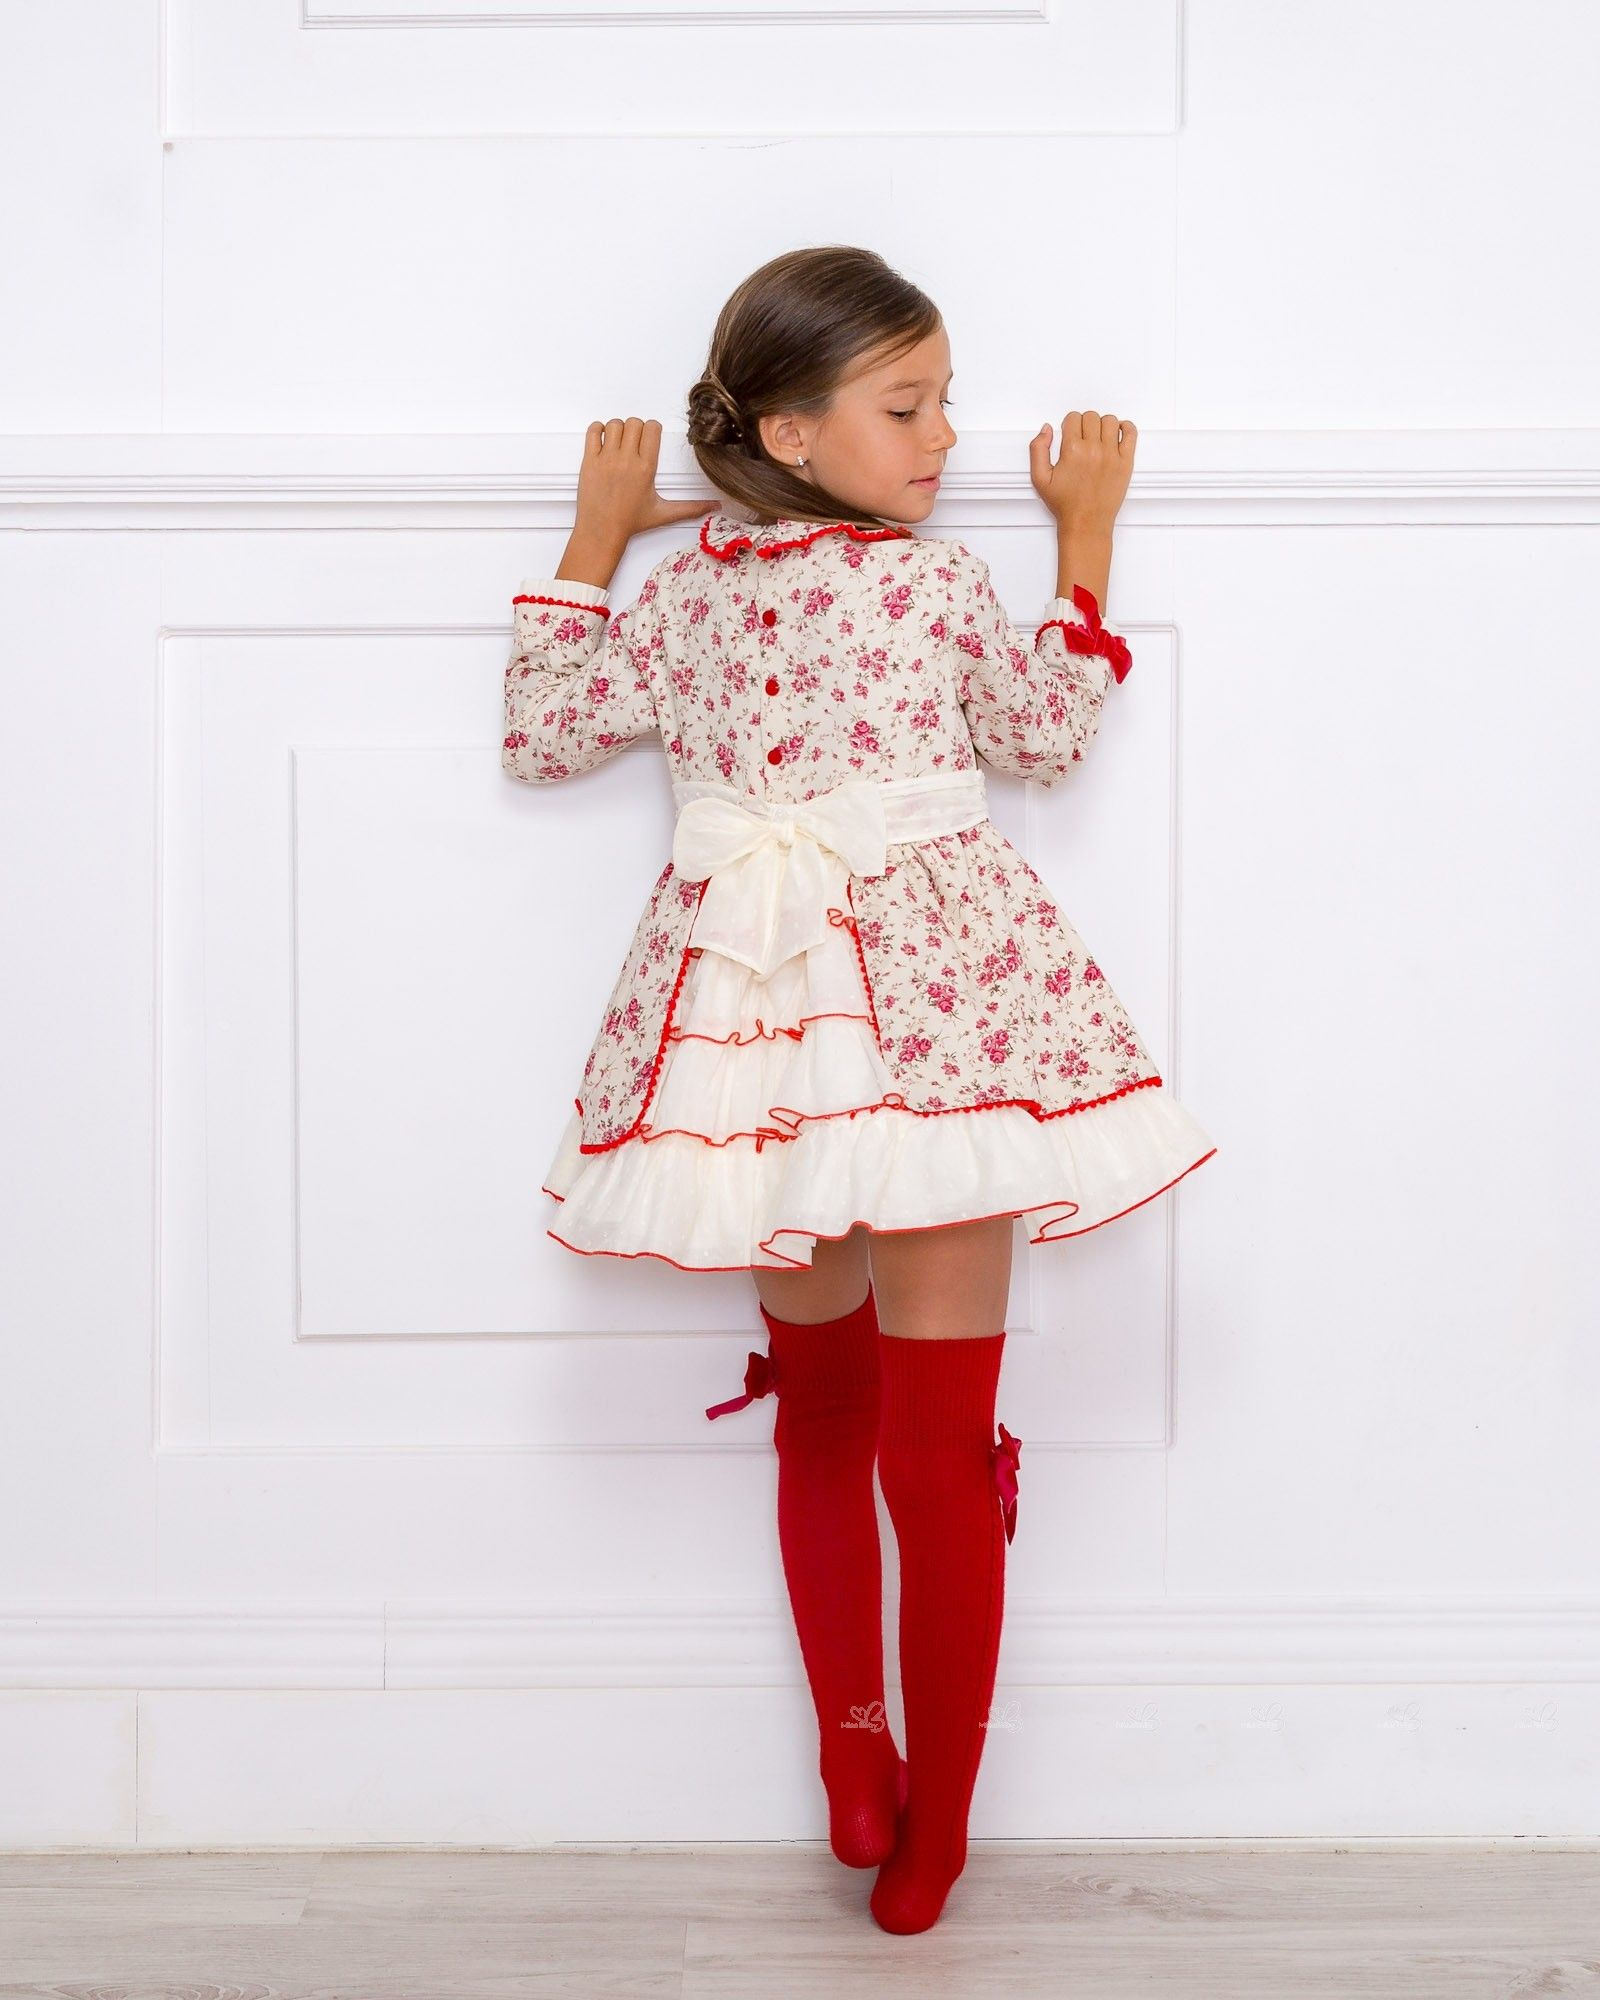 1e038d0a3 Outfit Vestido Estampado Floral Rojo con Calzas Rojas | Cute girls ...